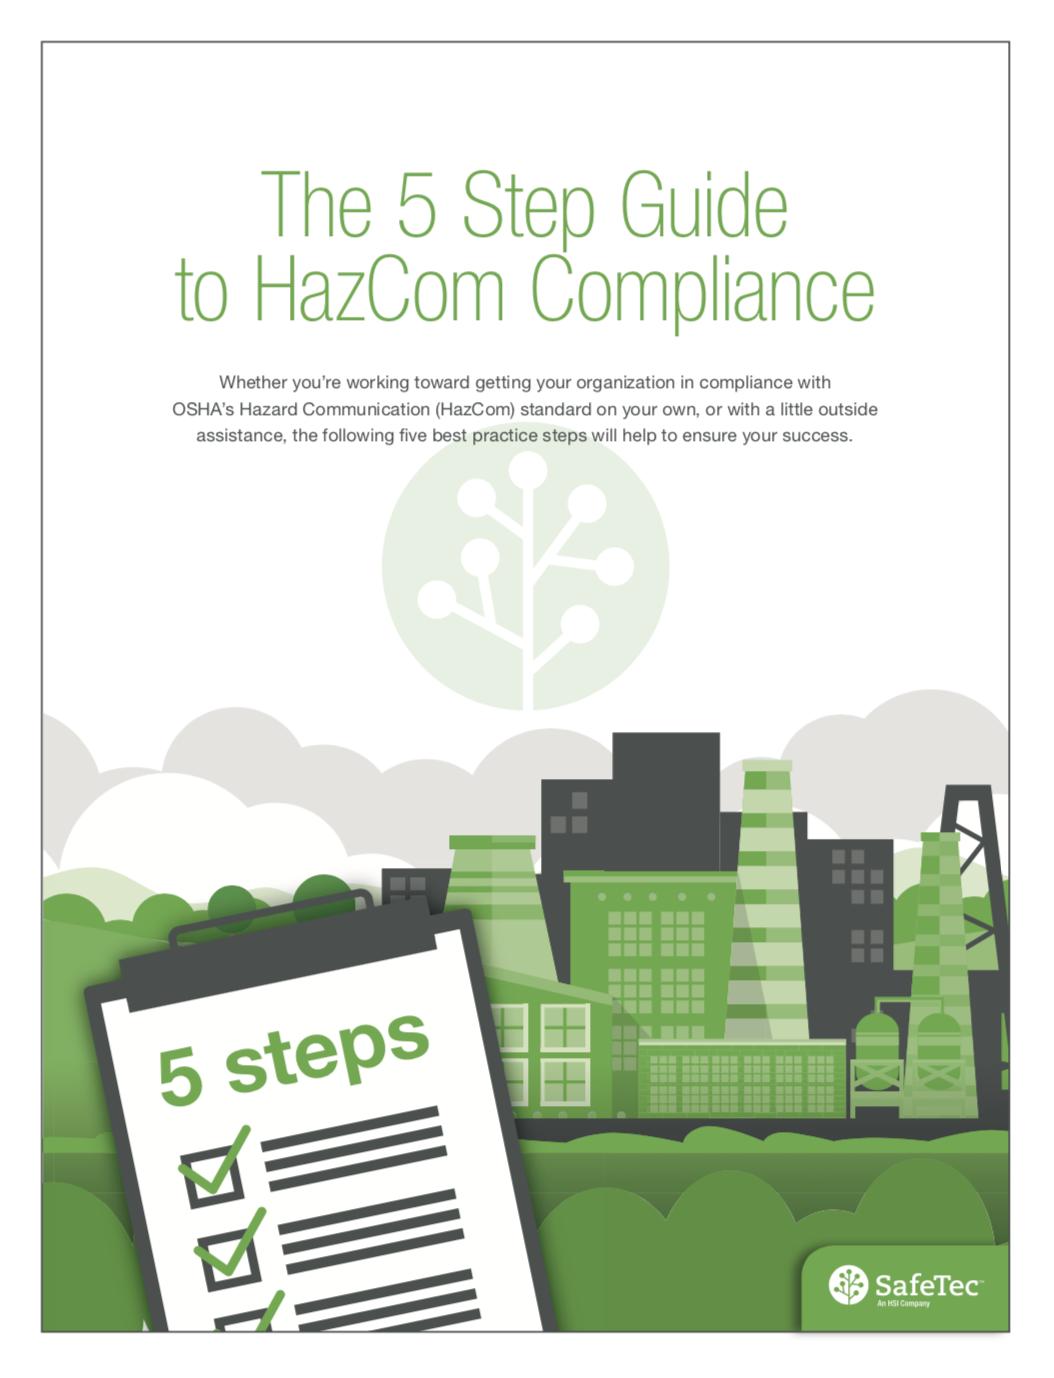 The 5 Step Guide to HazCom Compliance eBook